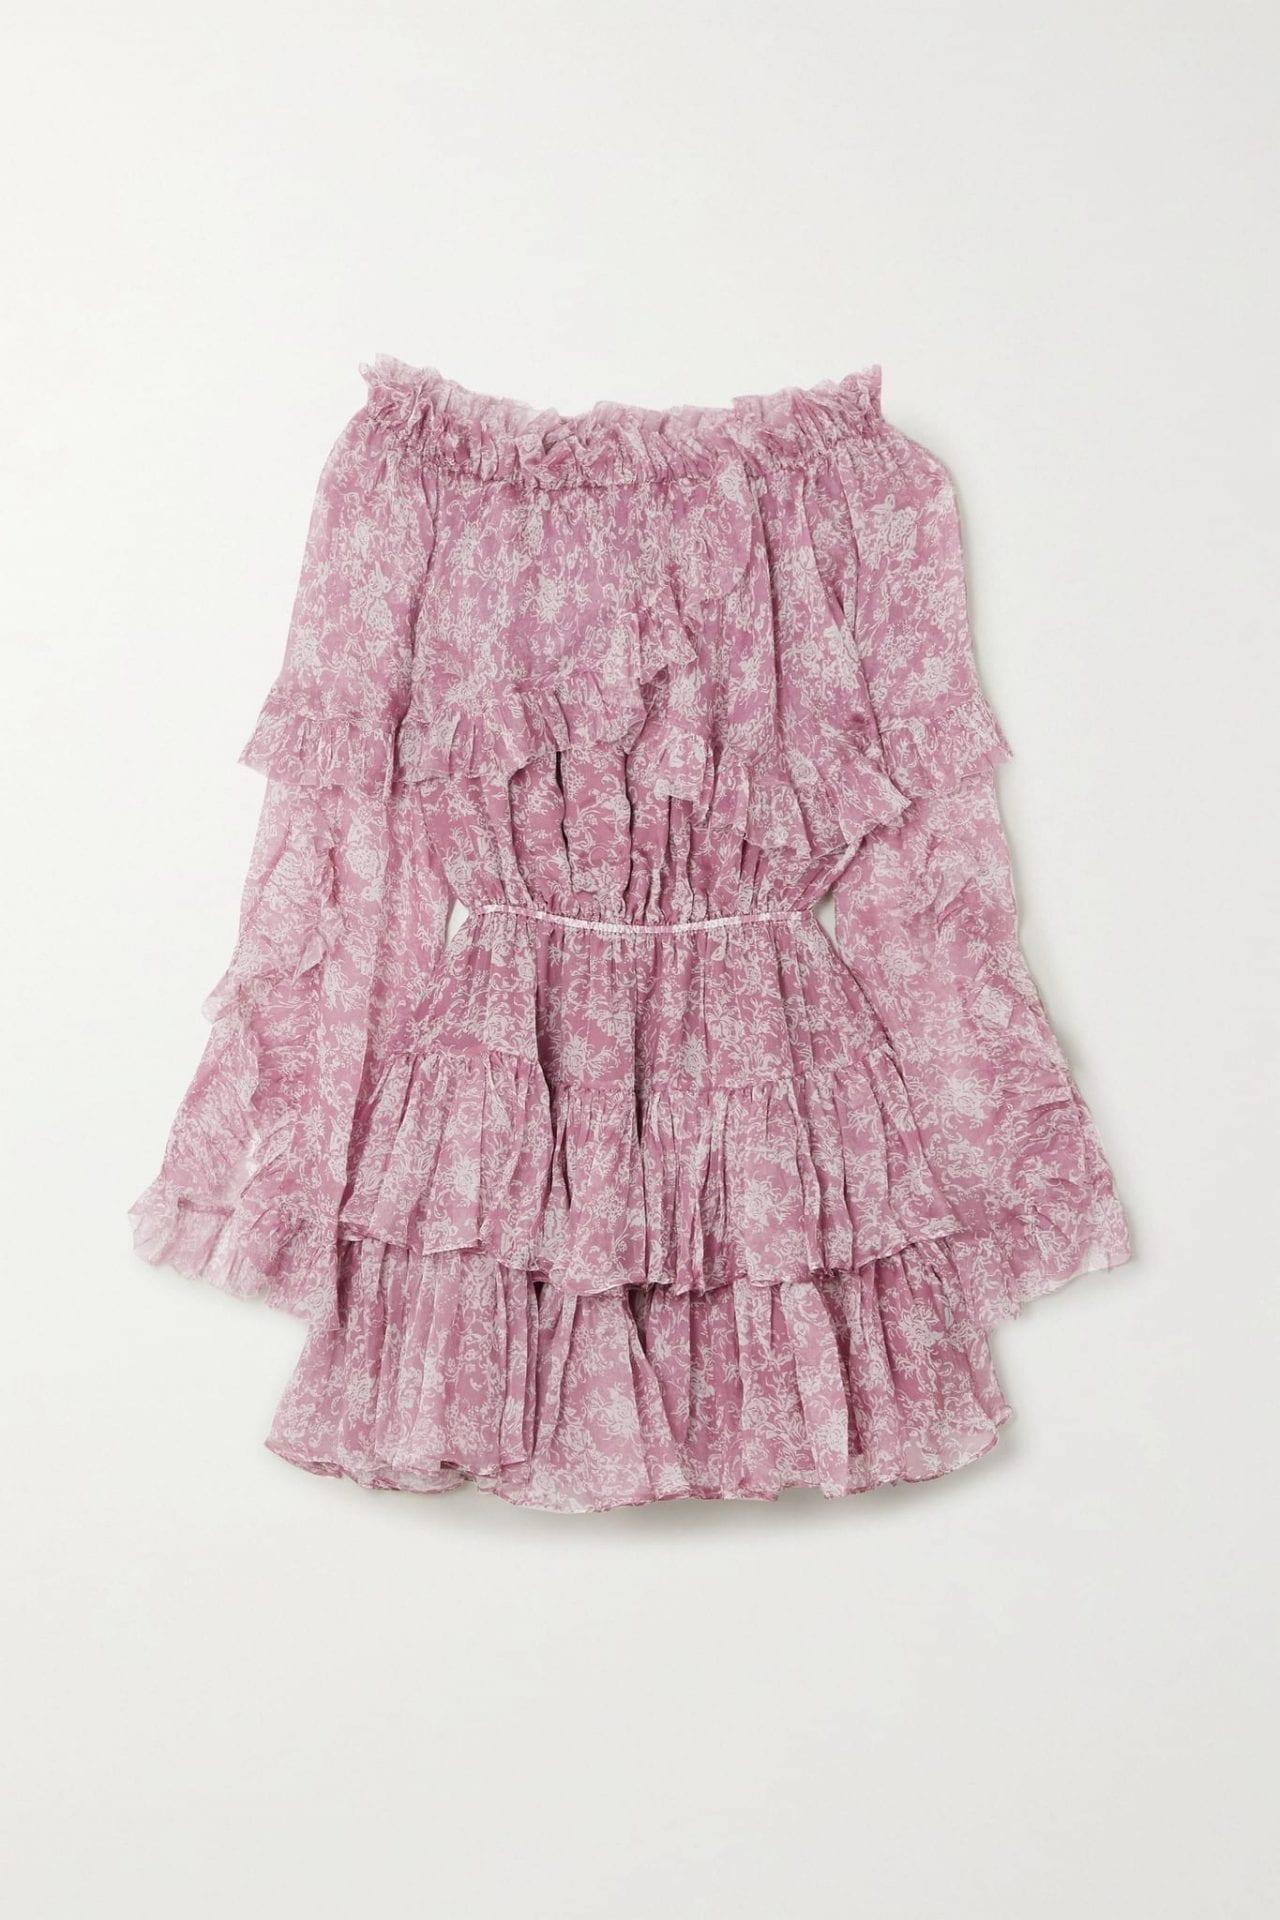 CAROLINE CONSTAS Dahlia Off-the-shoulder Ruffled Silk-chiffon Mini Dress